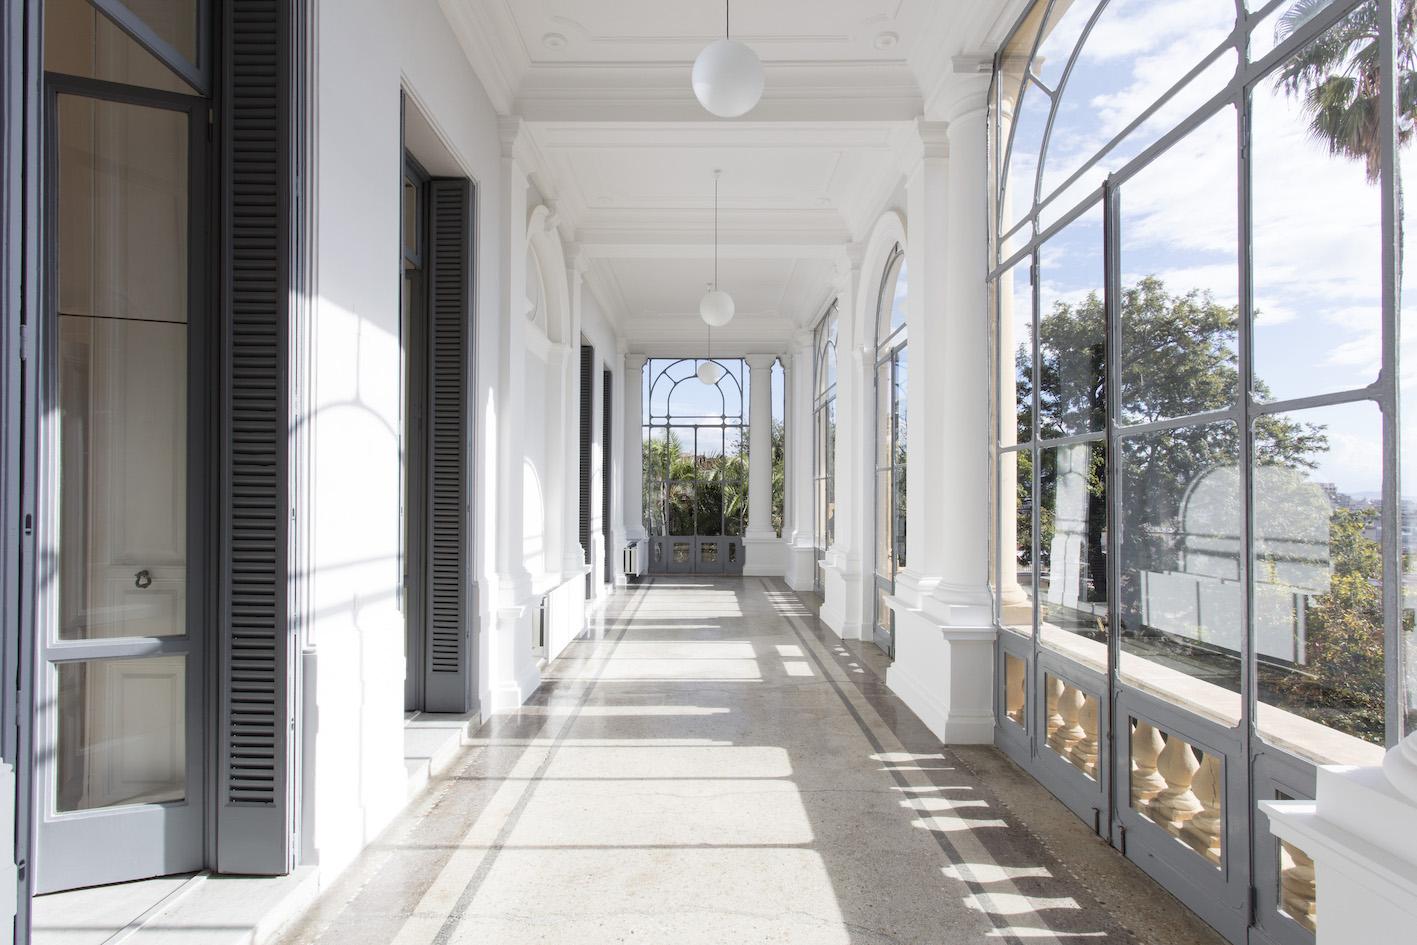 Thomas Dane Gallery in Naples Photo: Amedeo Benestante